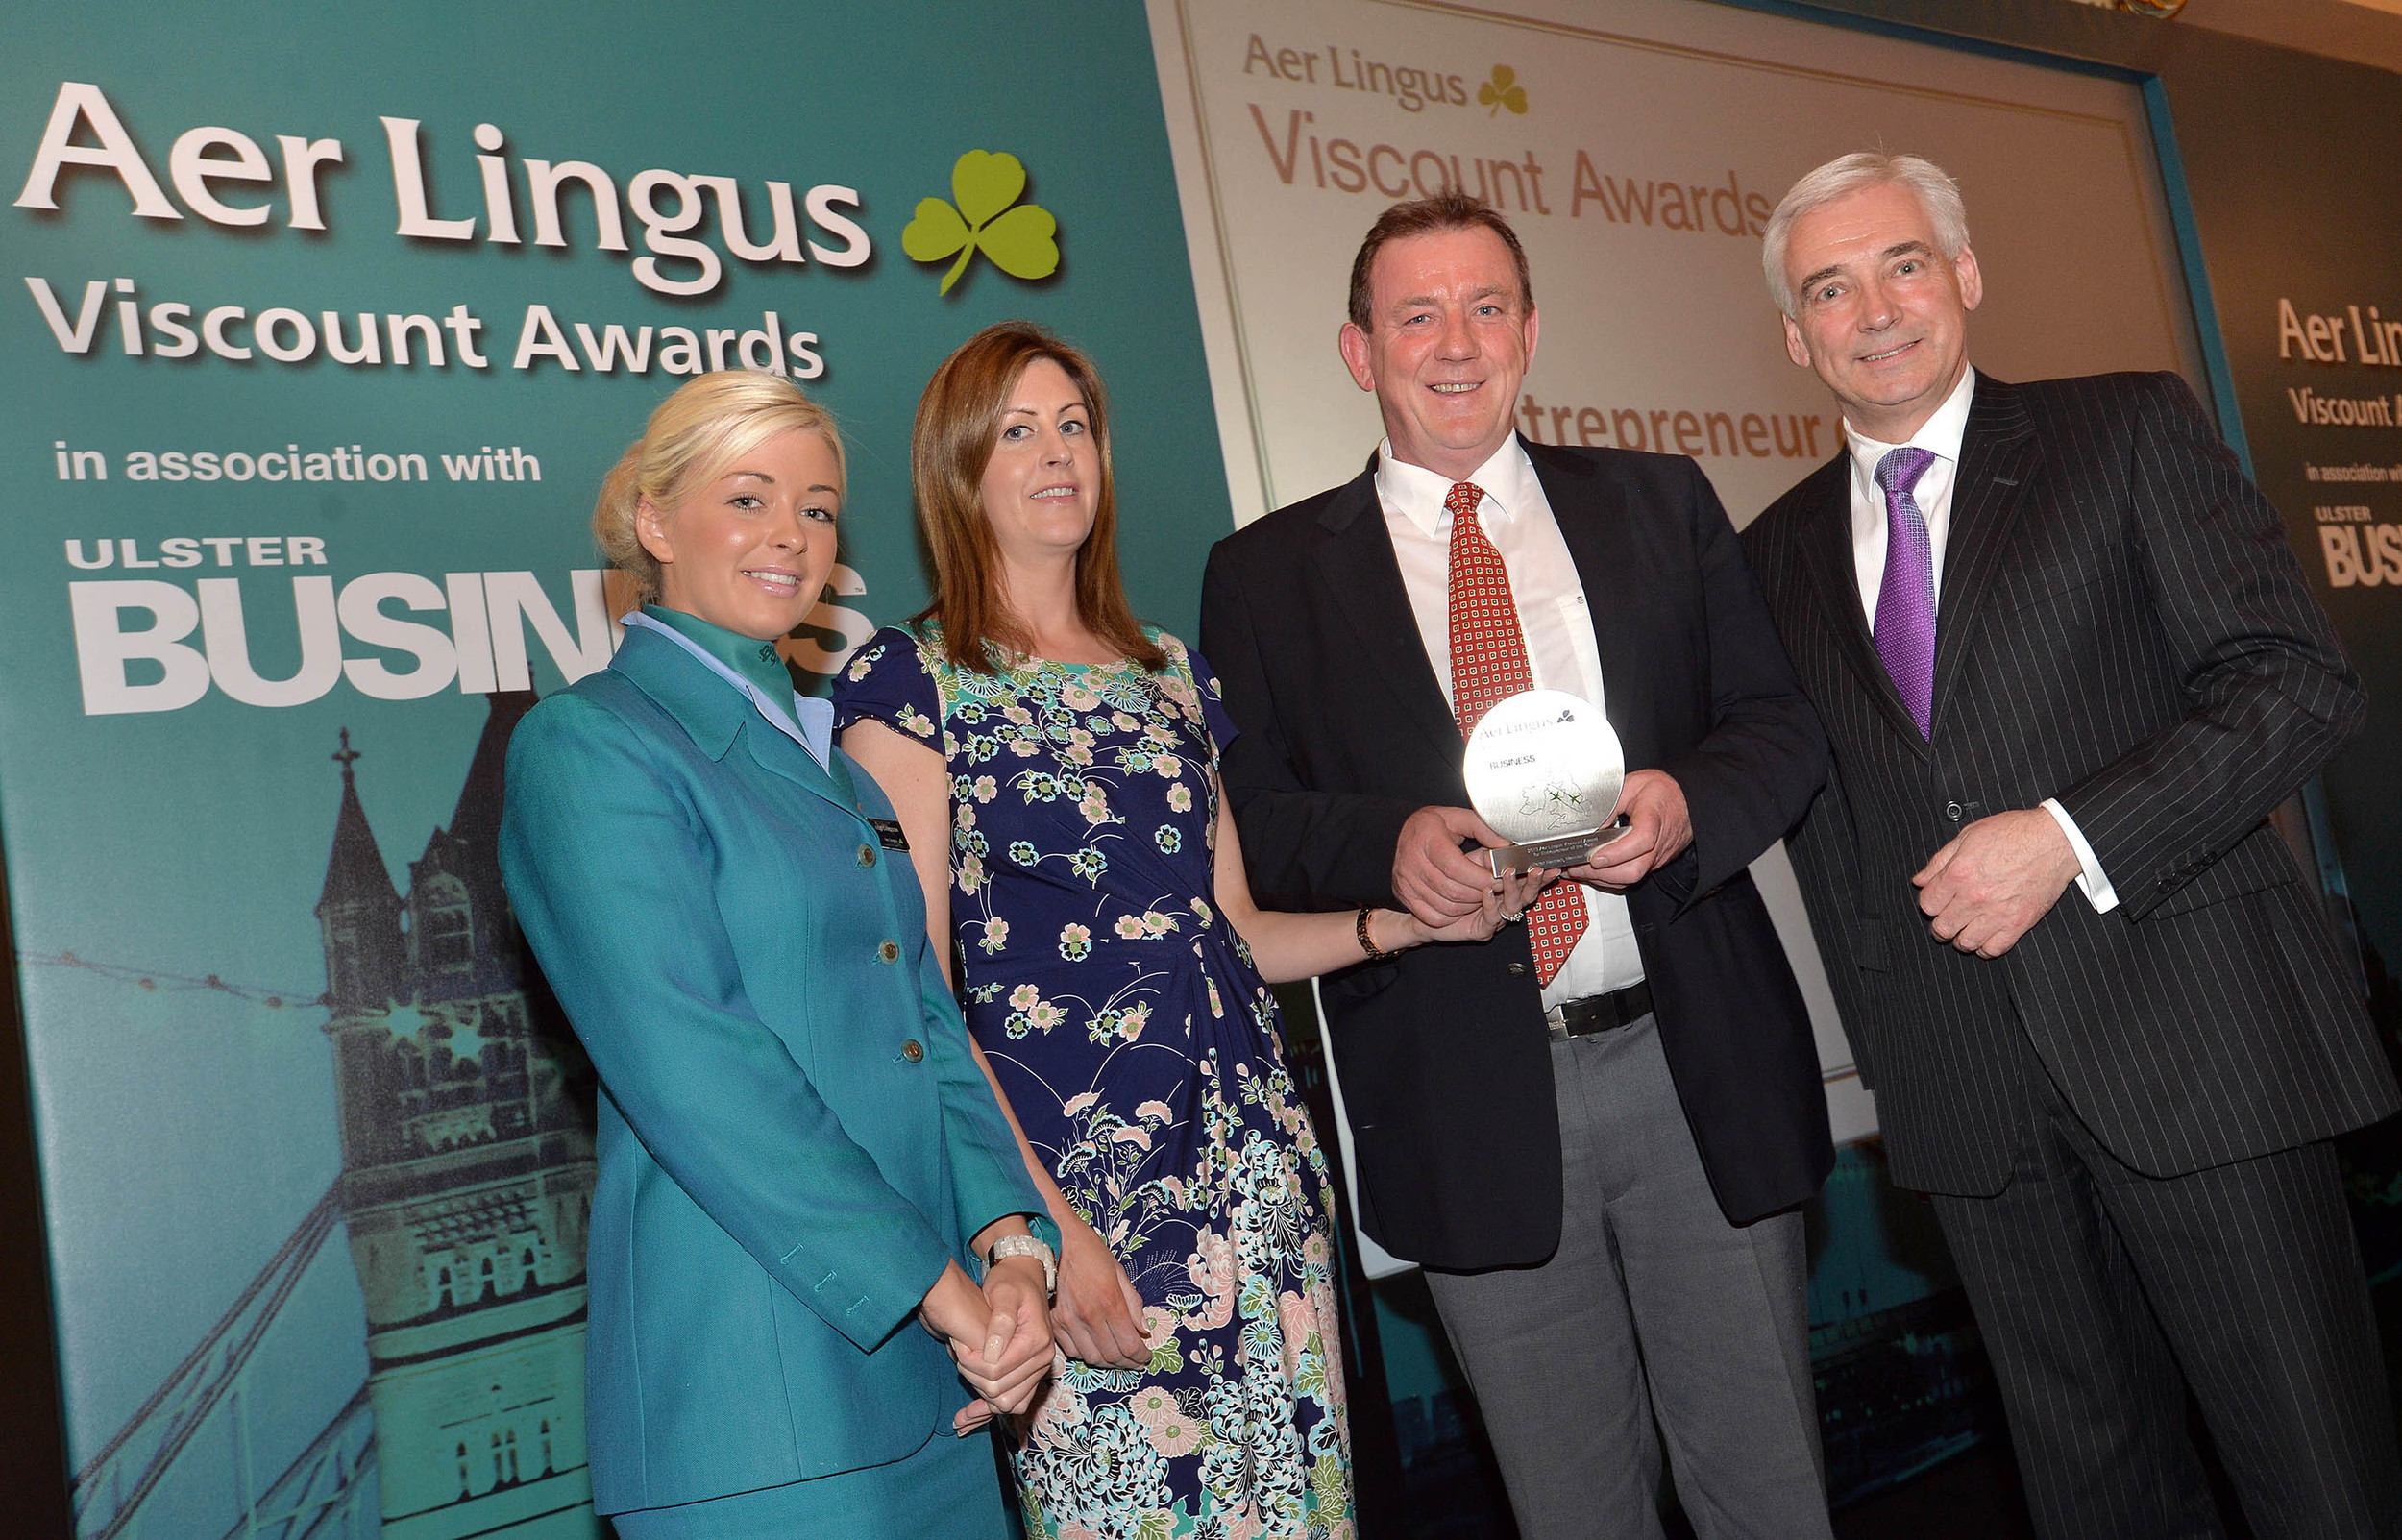 Aer Lingus Entrepreneur of the Year 2013